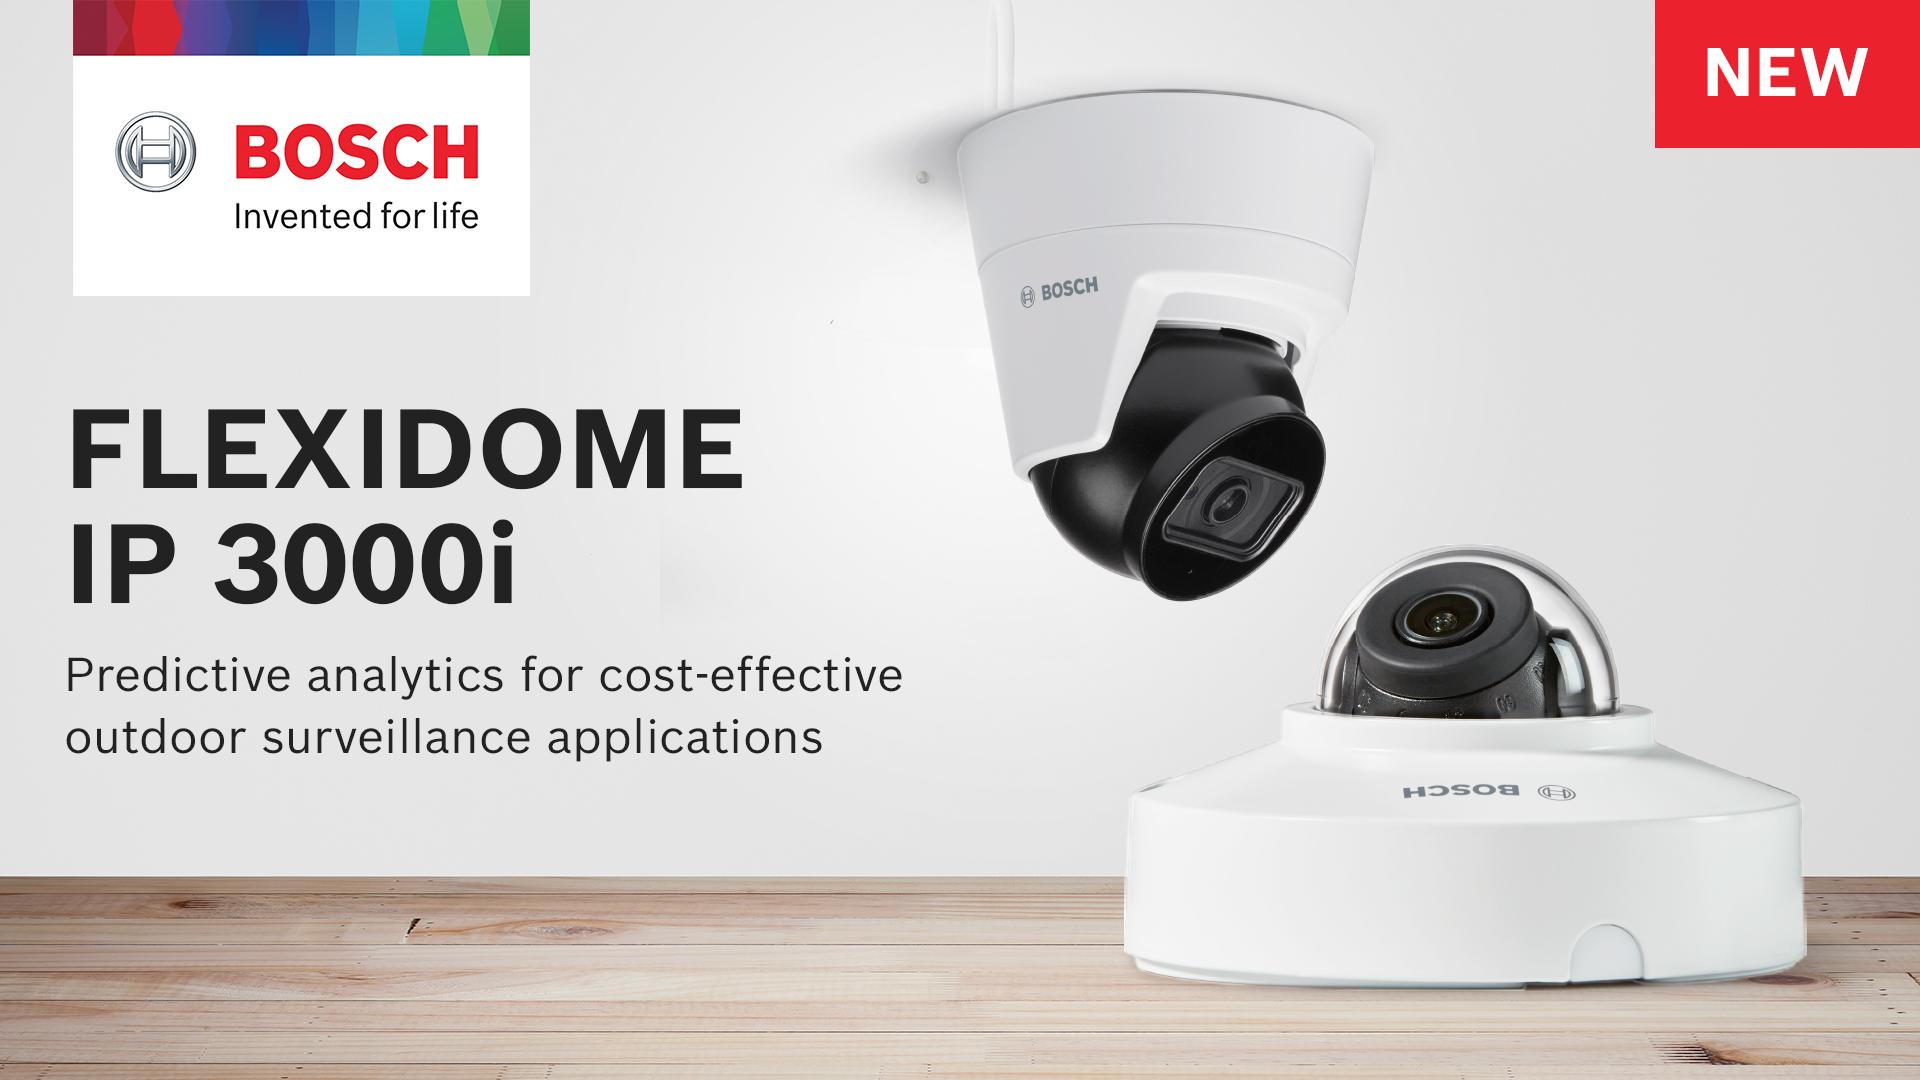 Bosch FLEXIDOME IP 3000i